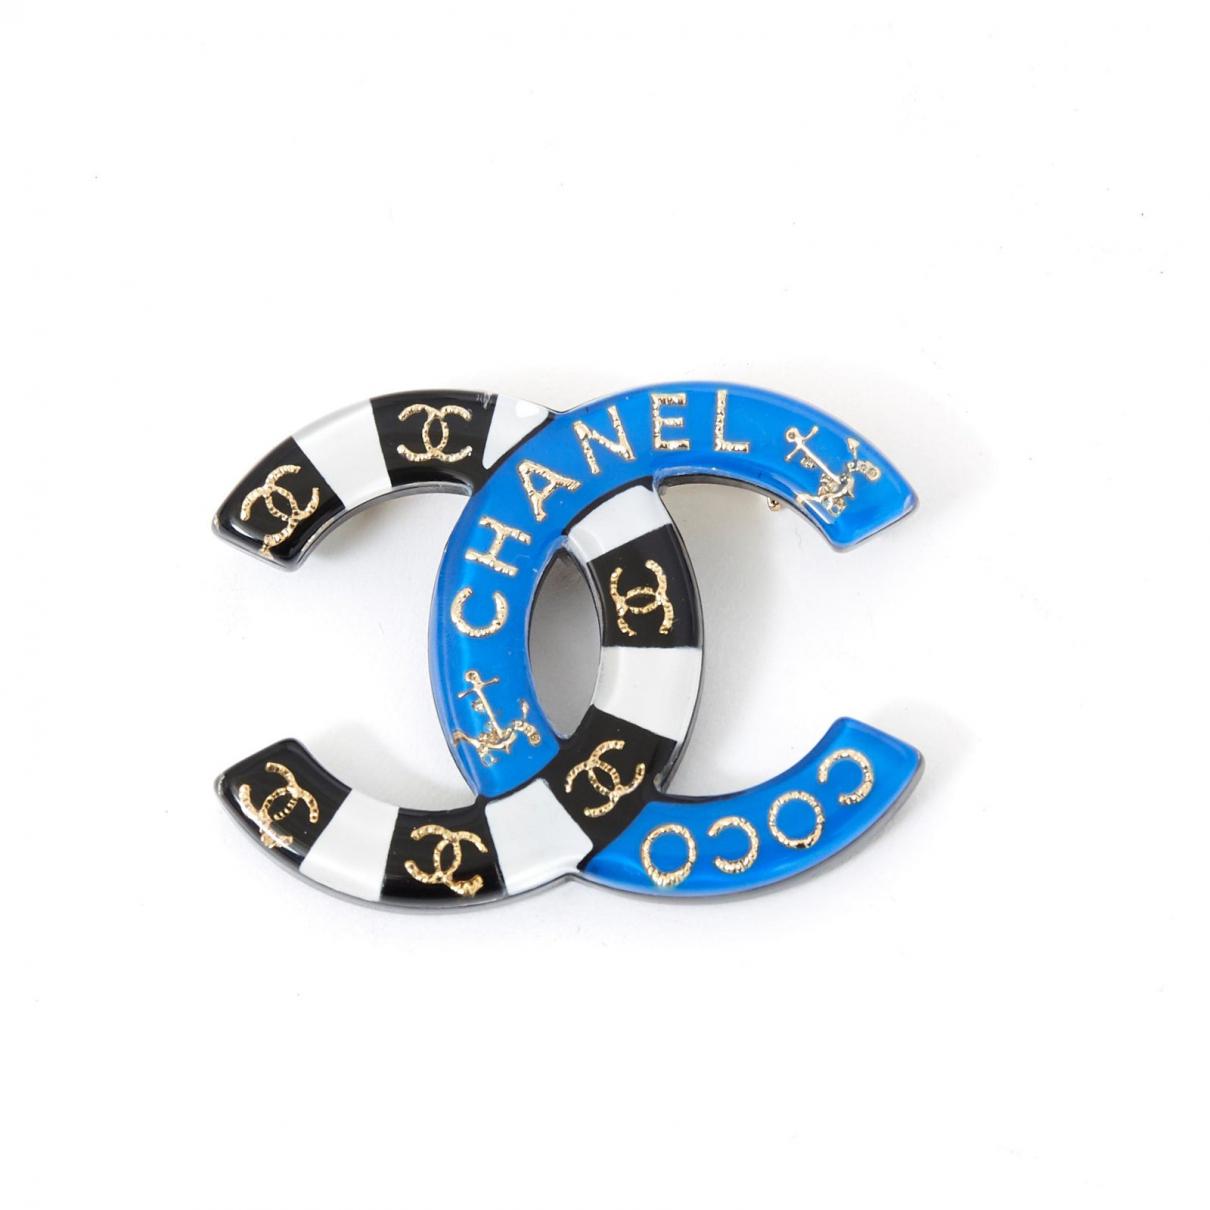 Chanel CC Brosche in Kunststoff